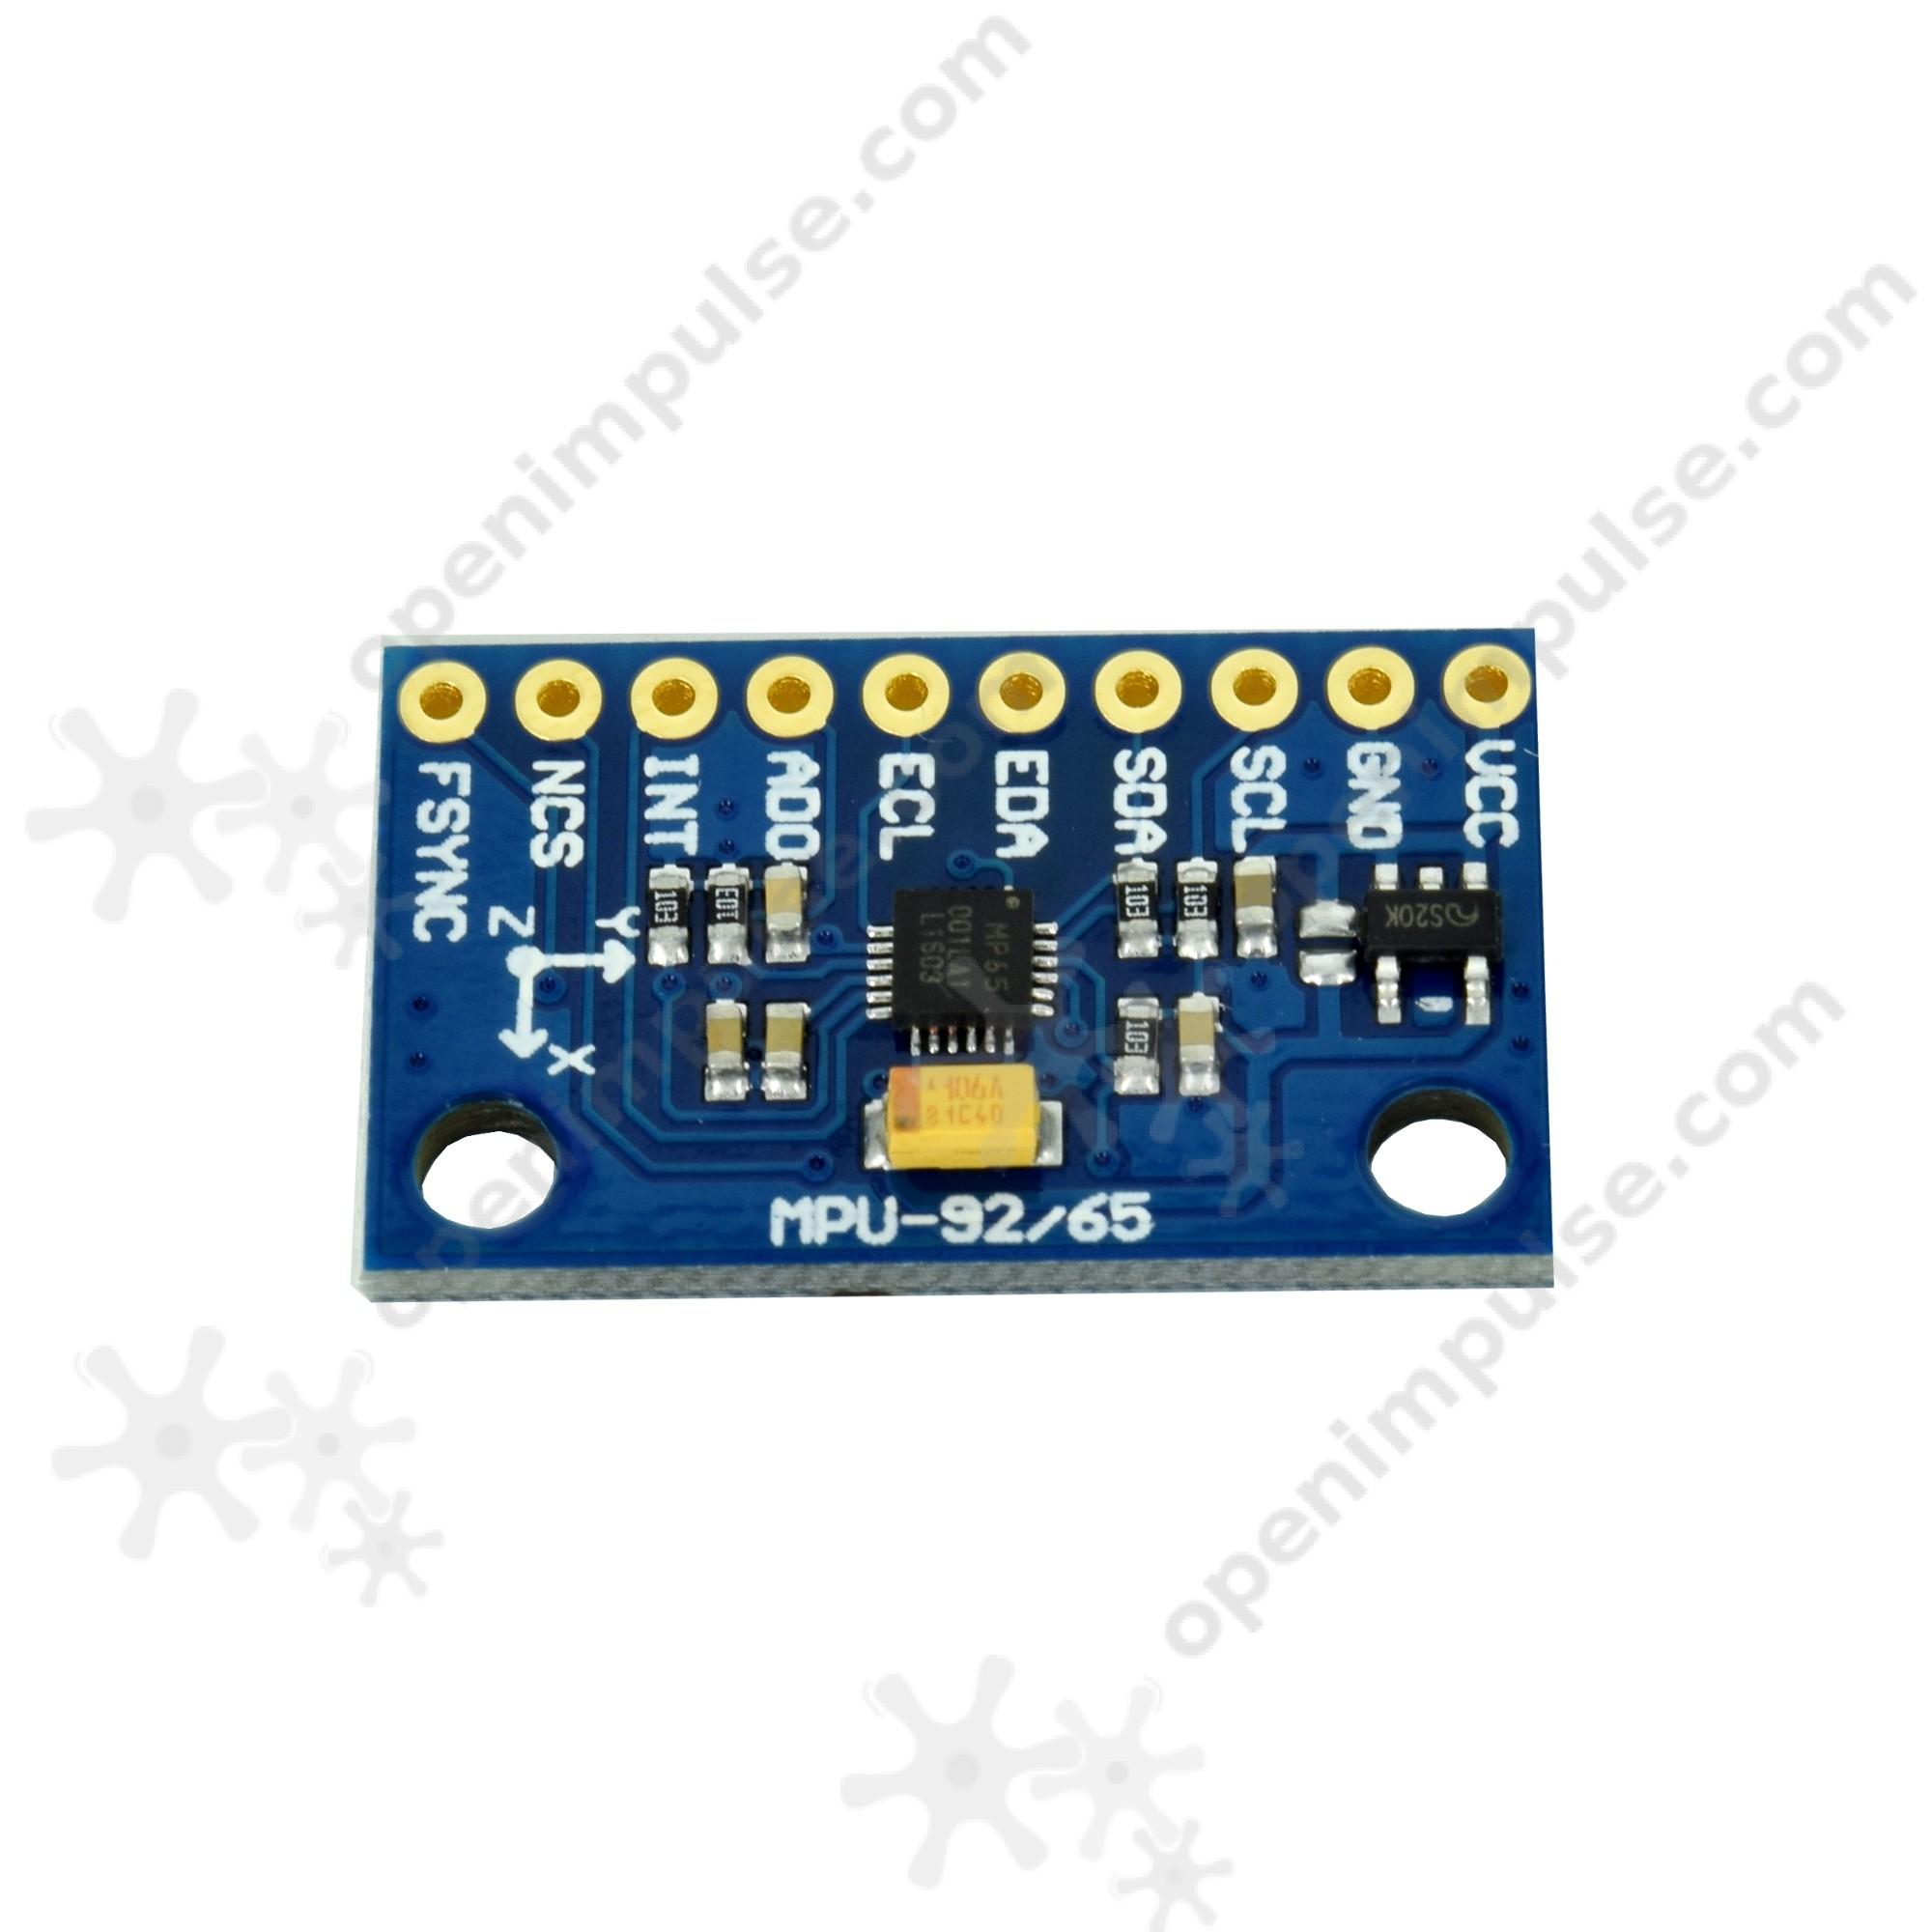 GY-MPU6500 Accelerometer and Gyroscope Module | Open